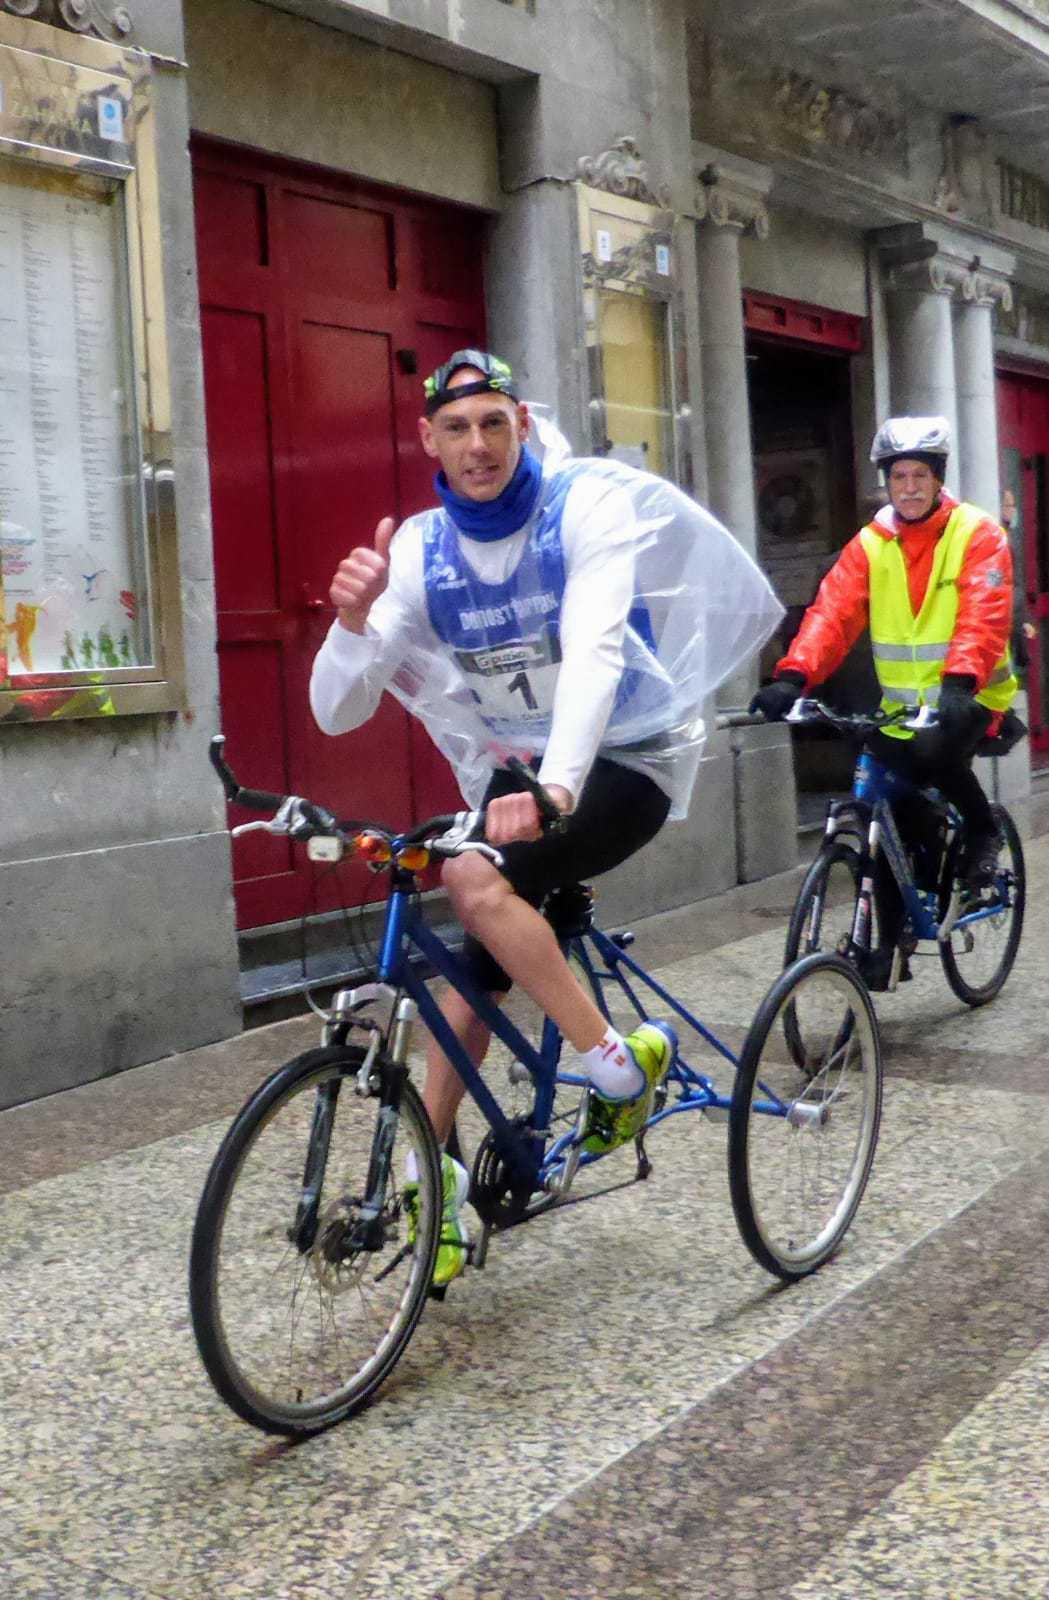 Richard participa en la carrera de 10km. Donostiarrak-UPV - Konporta